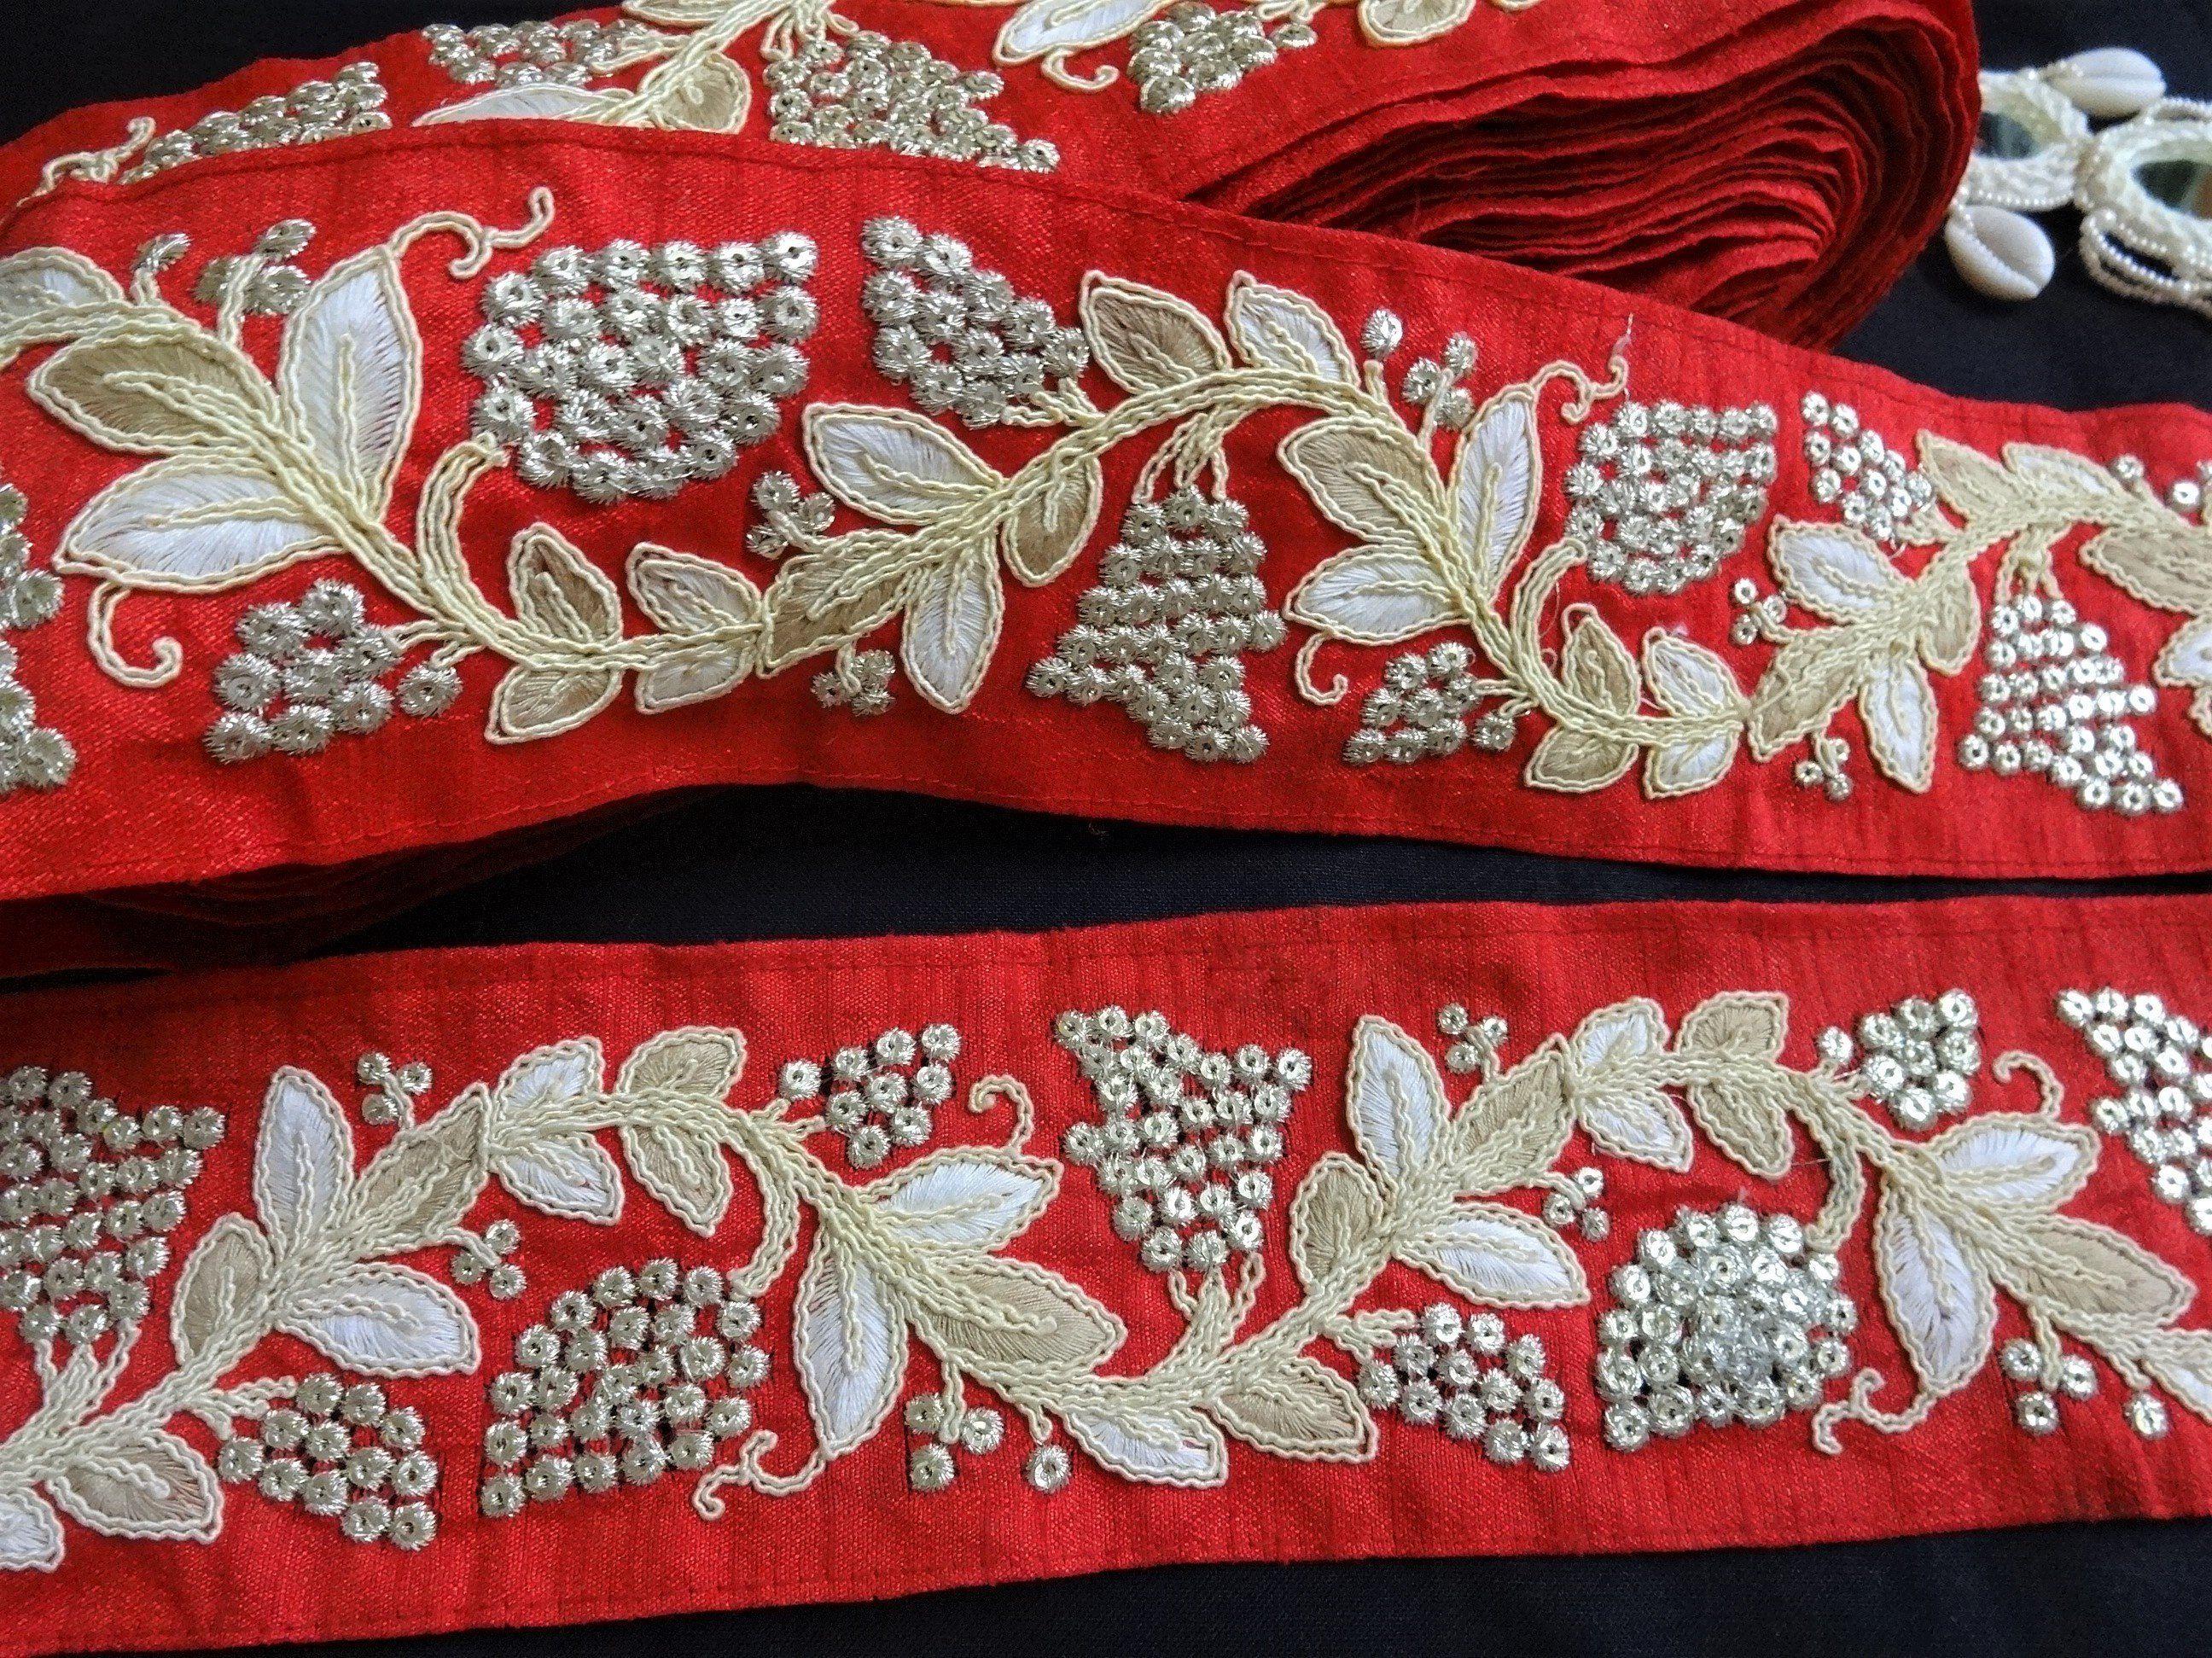 1 Yd Handcrafted Blue Trim Beaded Braided Sew Designer Dress Border Ribbon Lace